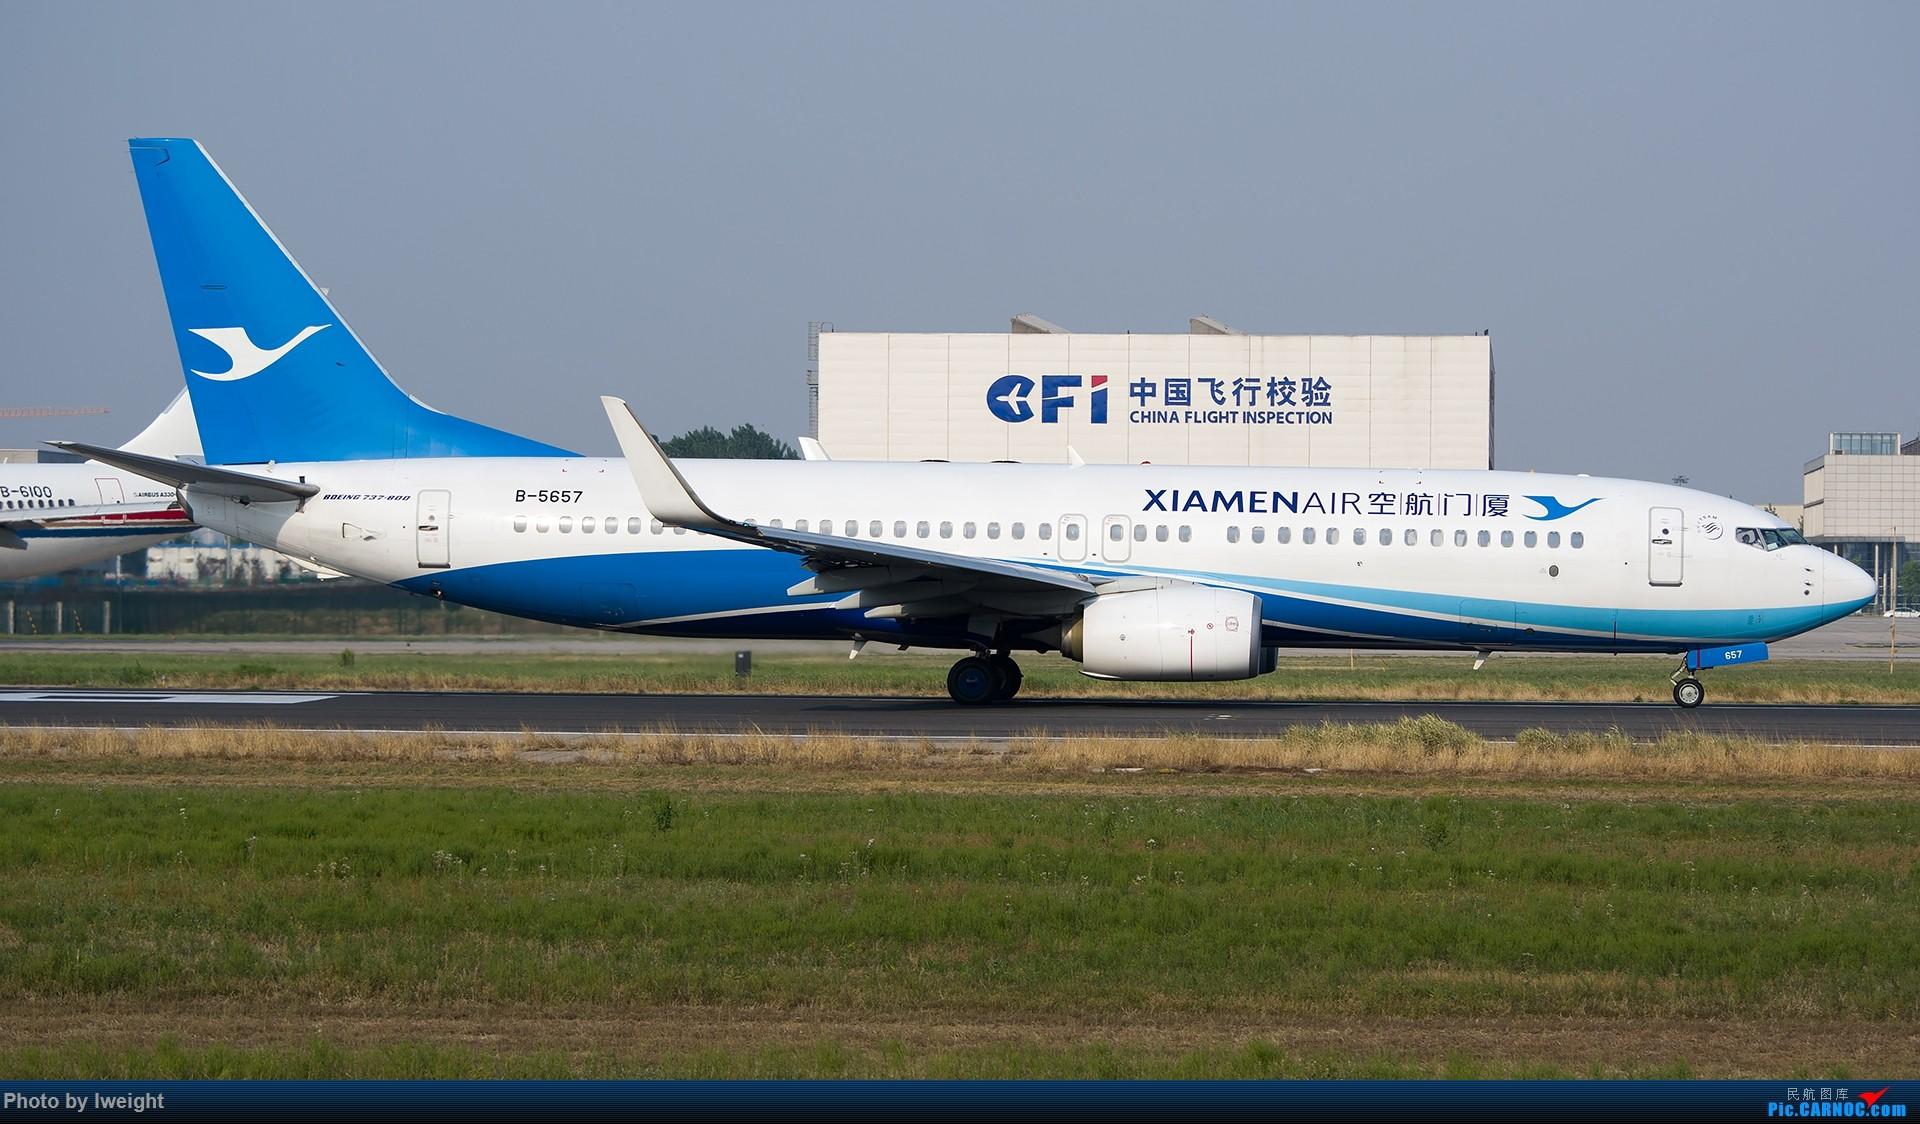 Re:[原创]周末帝都霾天拍机,凑合看看吧【2015-5-23】 BOEING 737-800 B-5657 中国北京首都国际机场